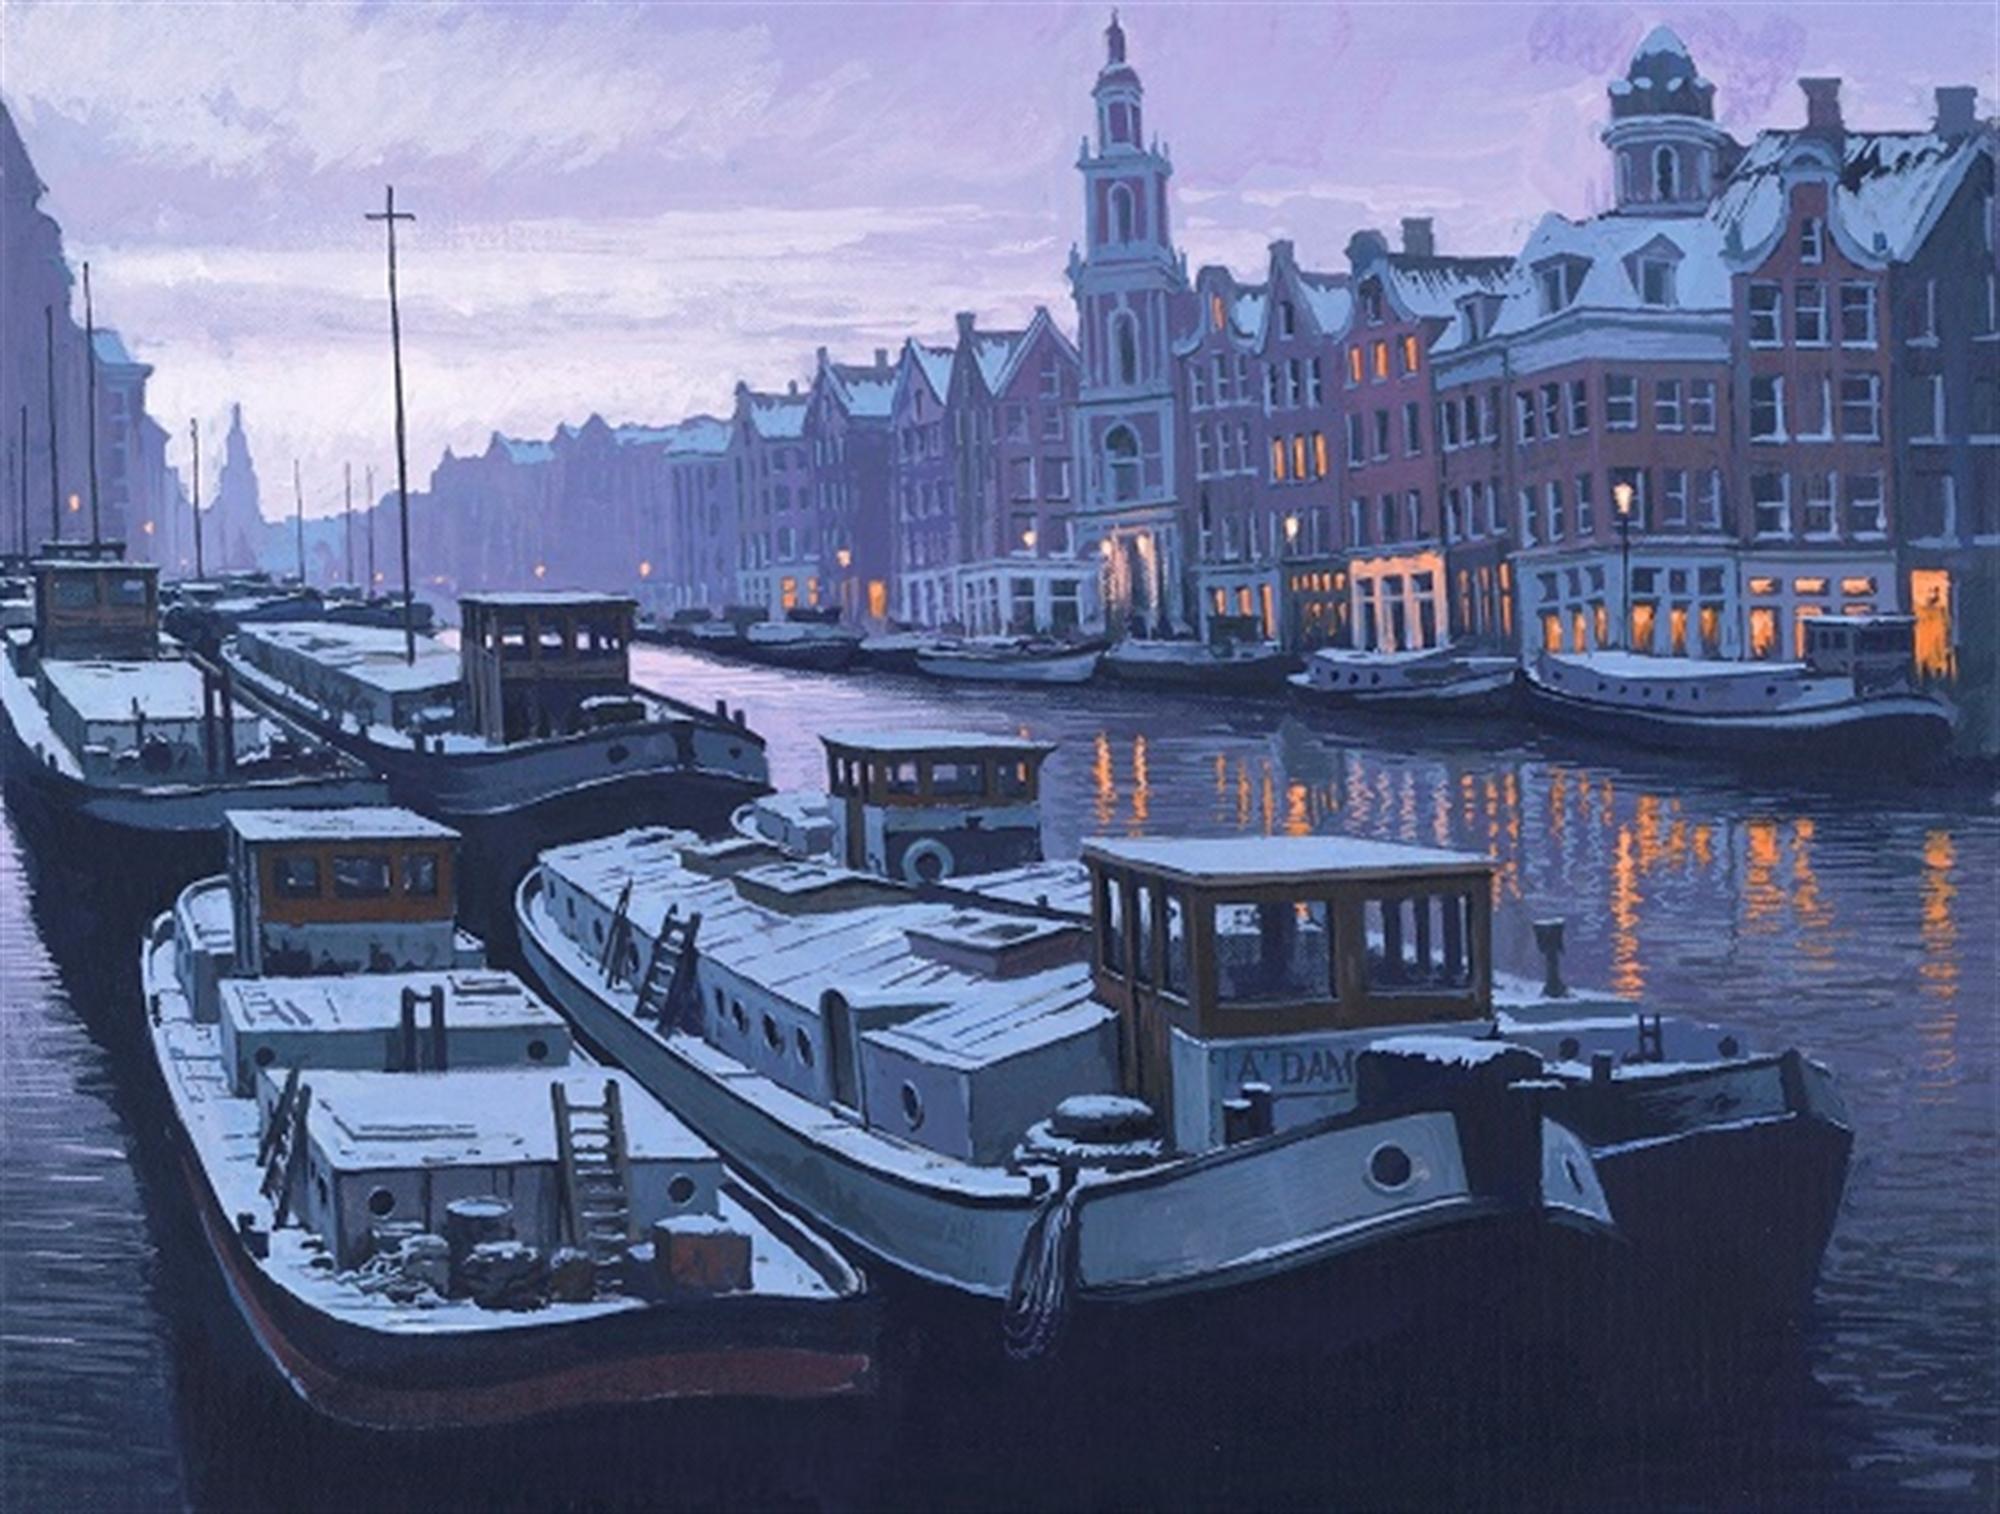 Daybreak - Amsterdam by Alexei Butirskiy